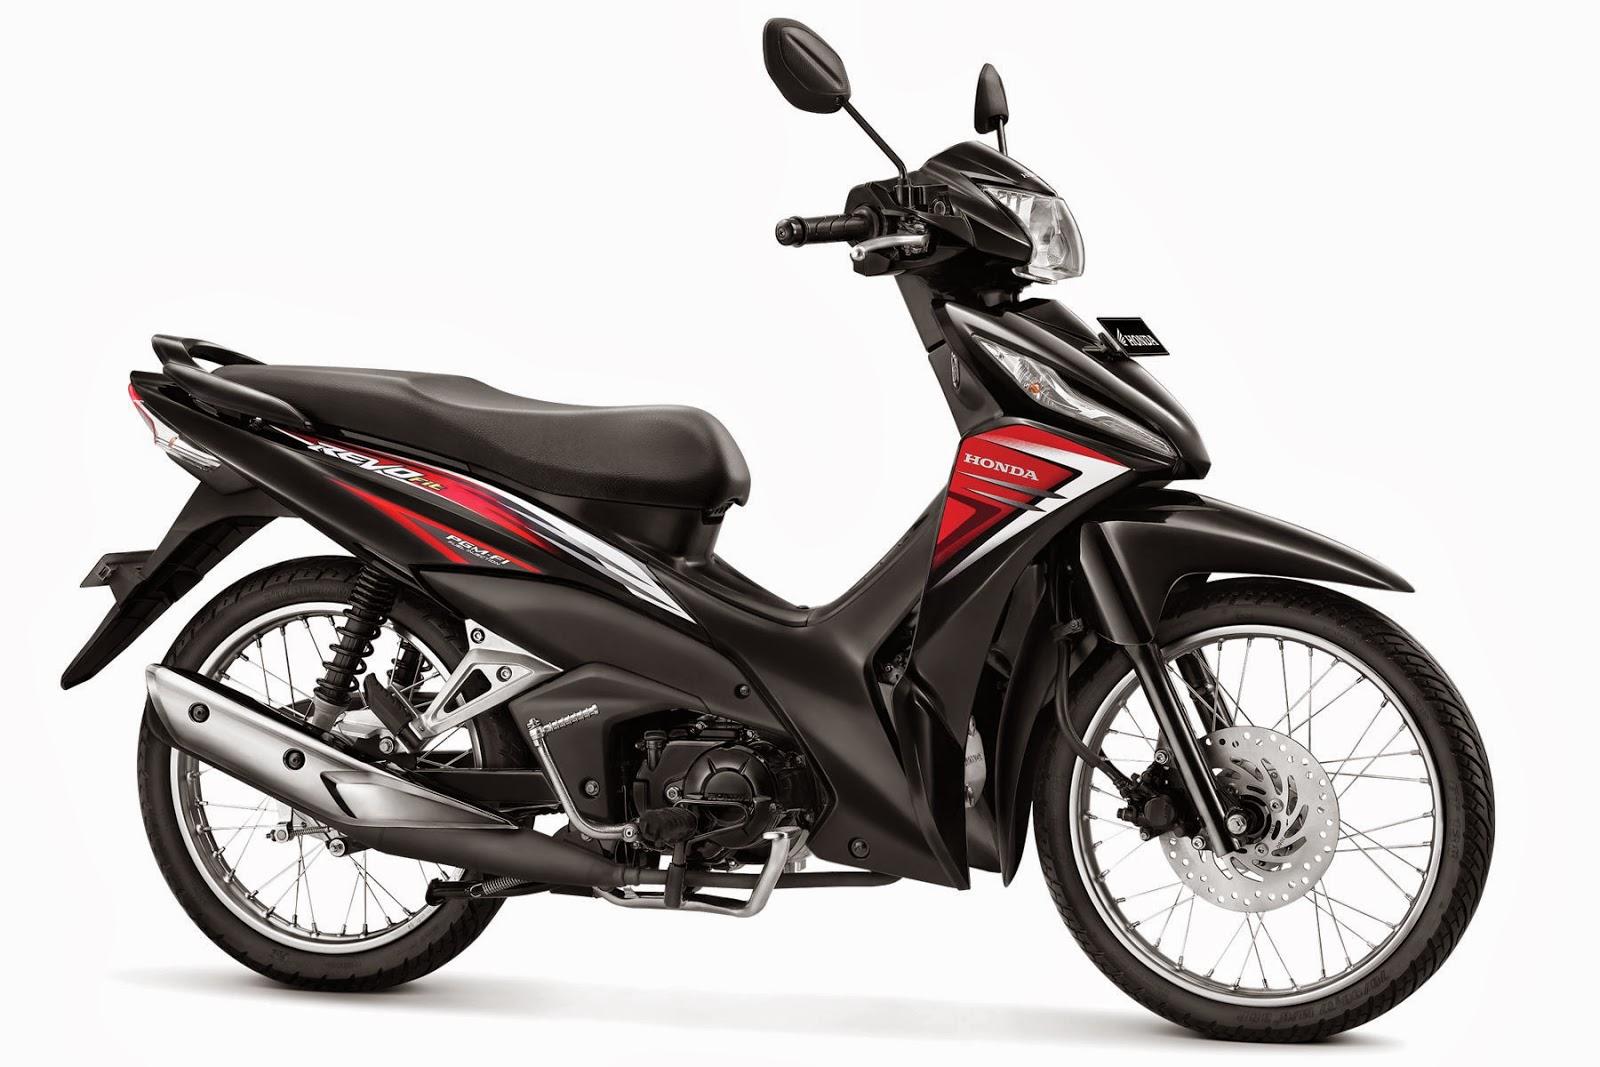 Harga Sepeda Motor Honda Revo Bekas